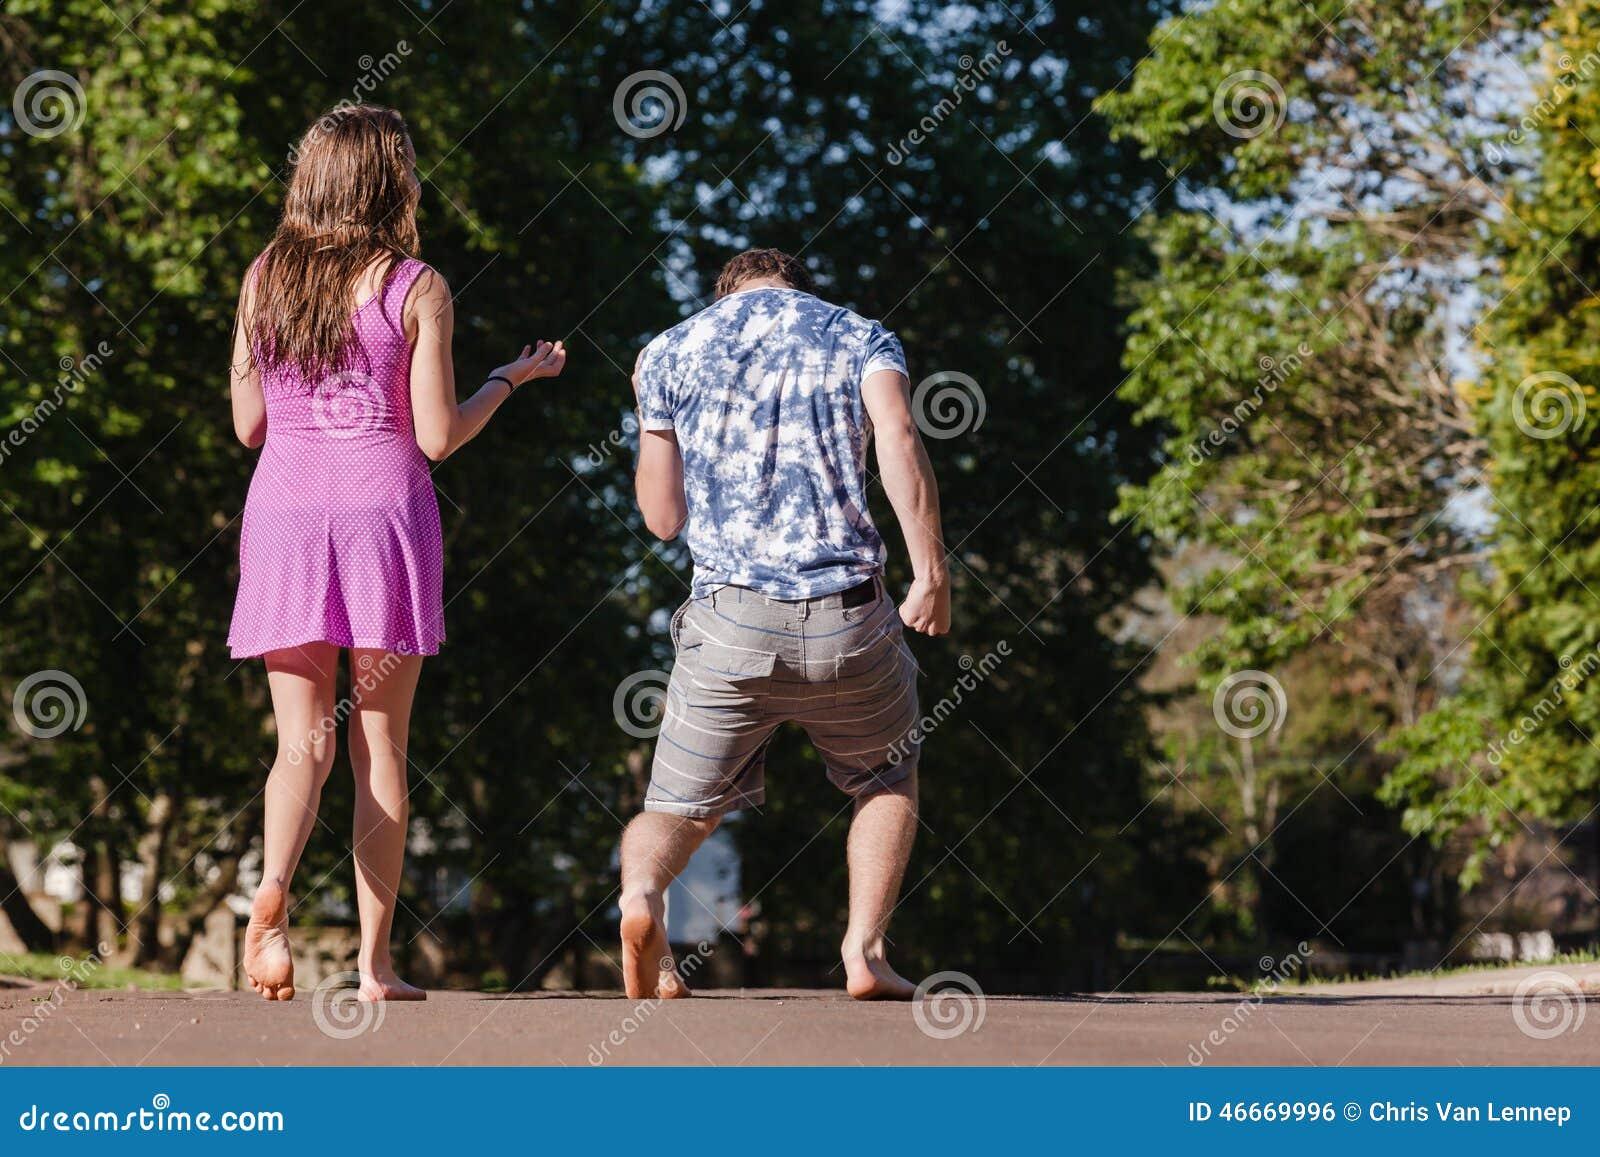 A Boy Walking Away From A Girl Boy Girl Walking Away Talking